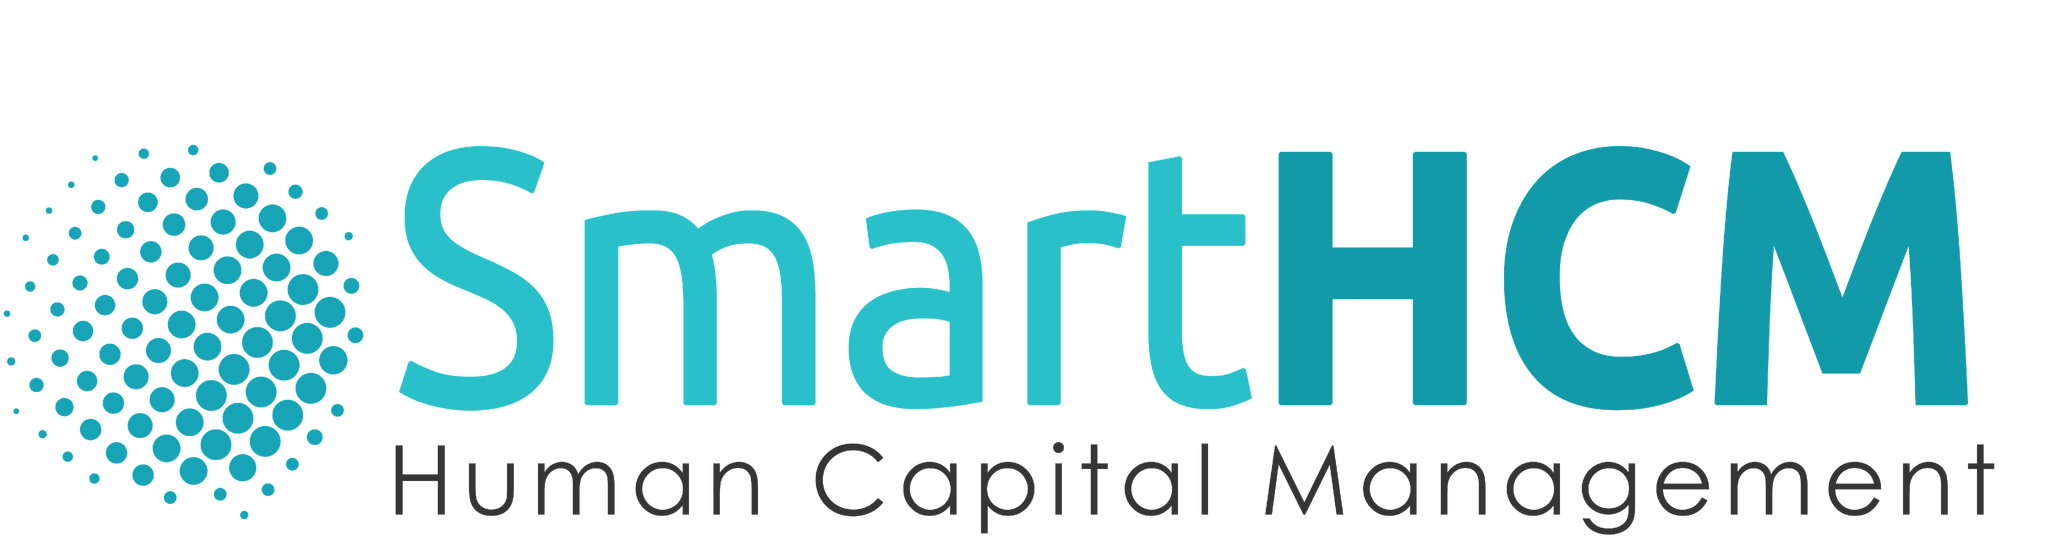 SofDigital Systems (SMCPvt Ltd)